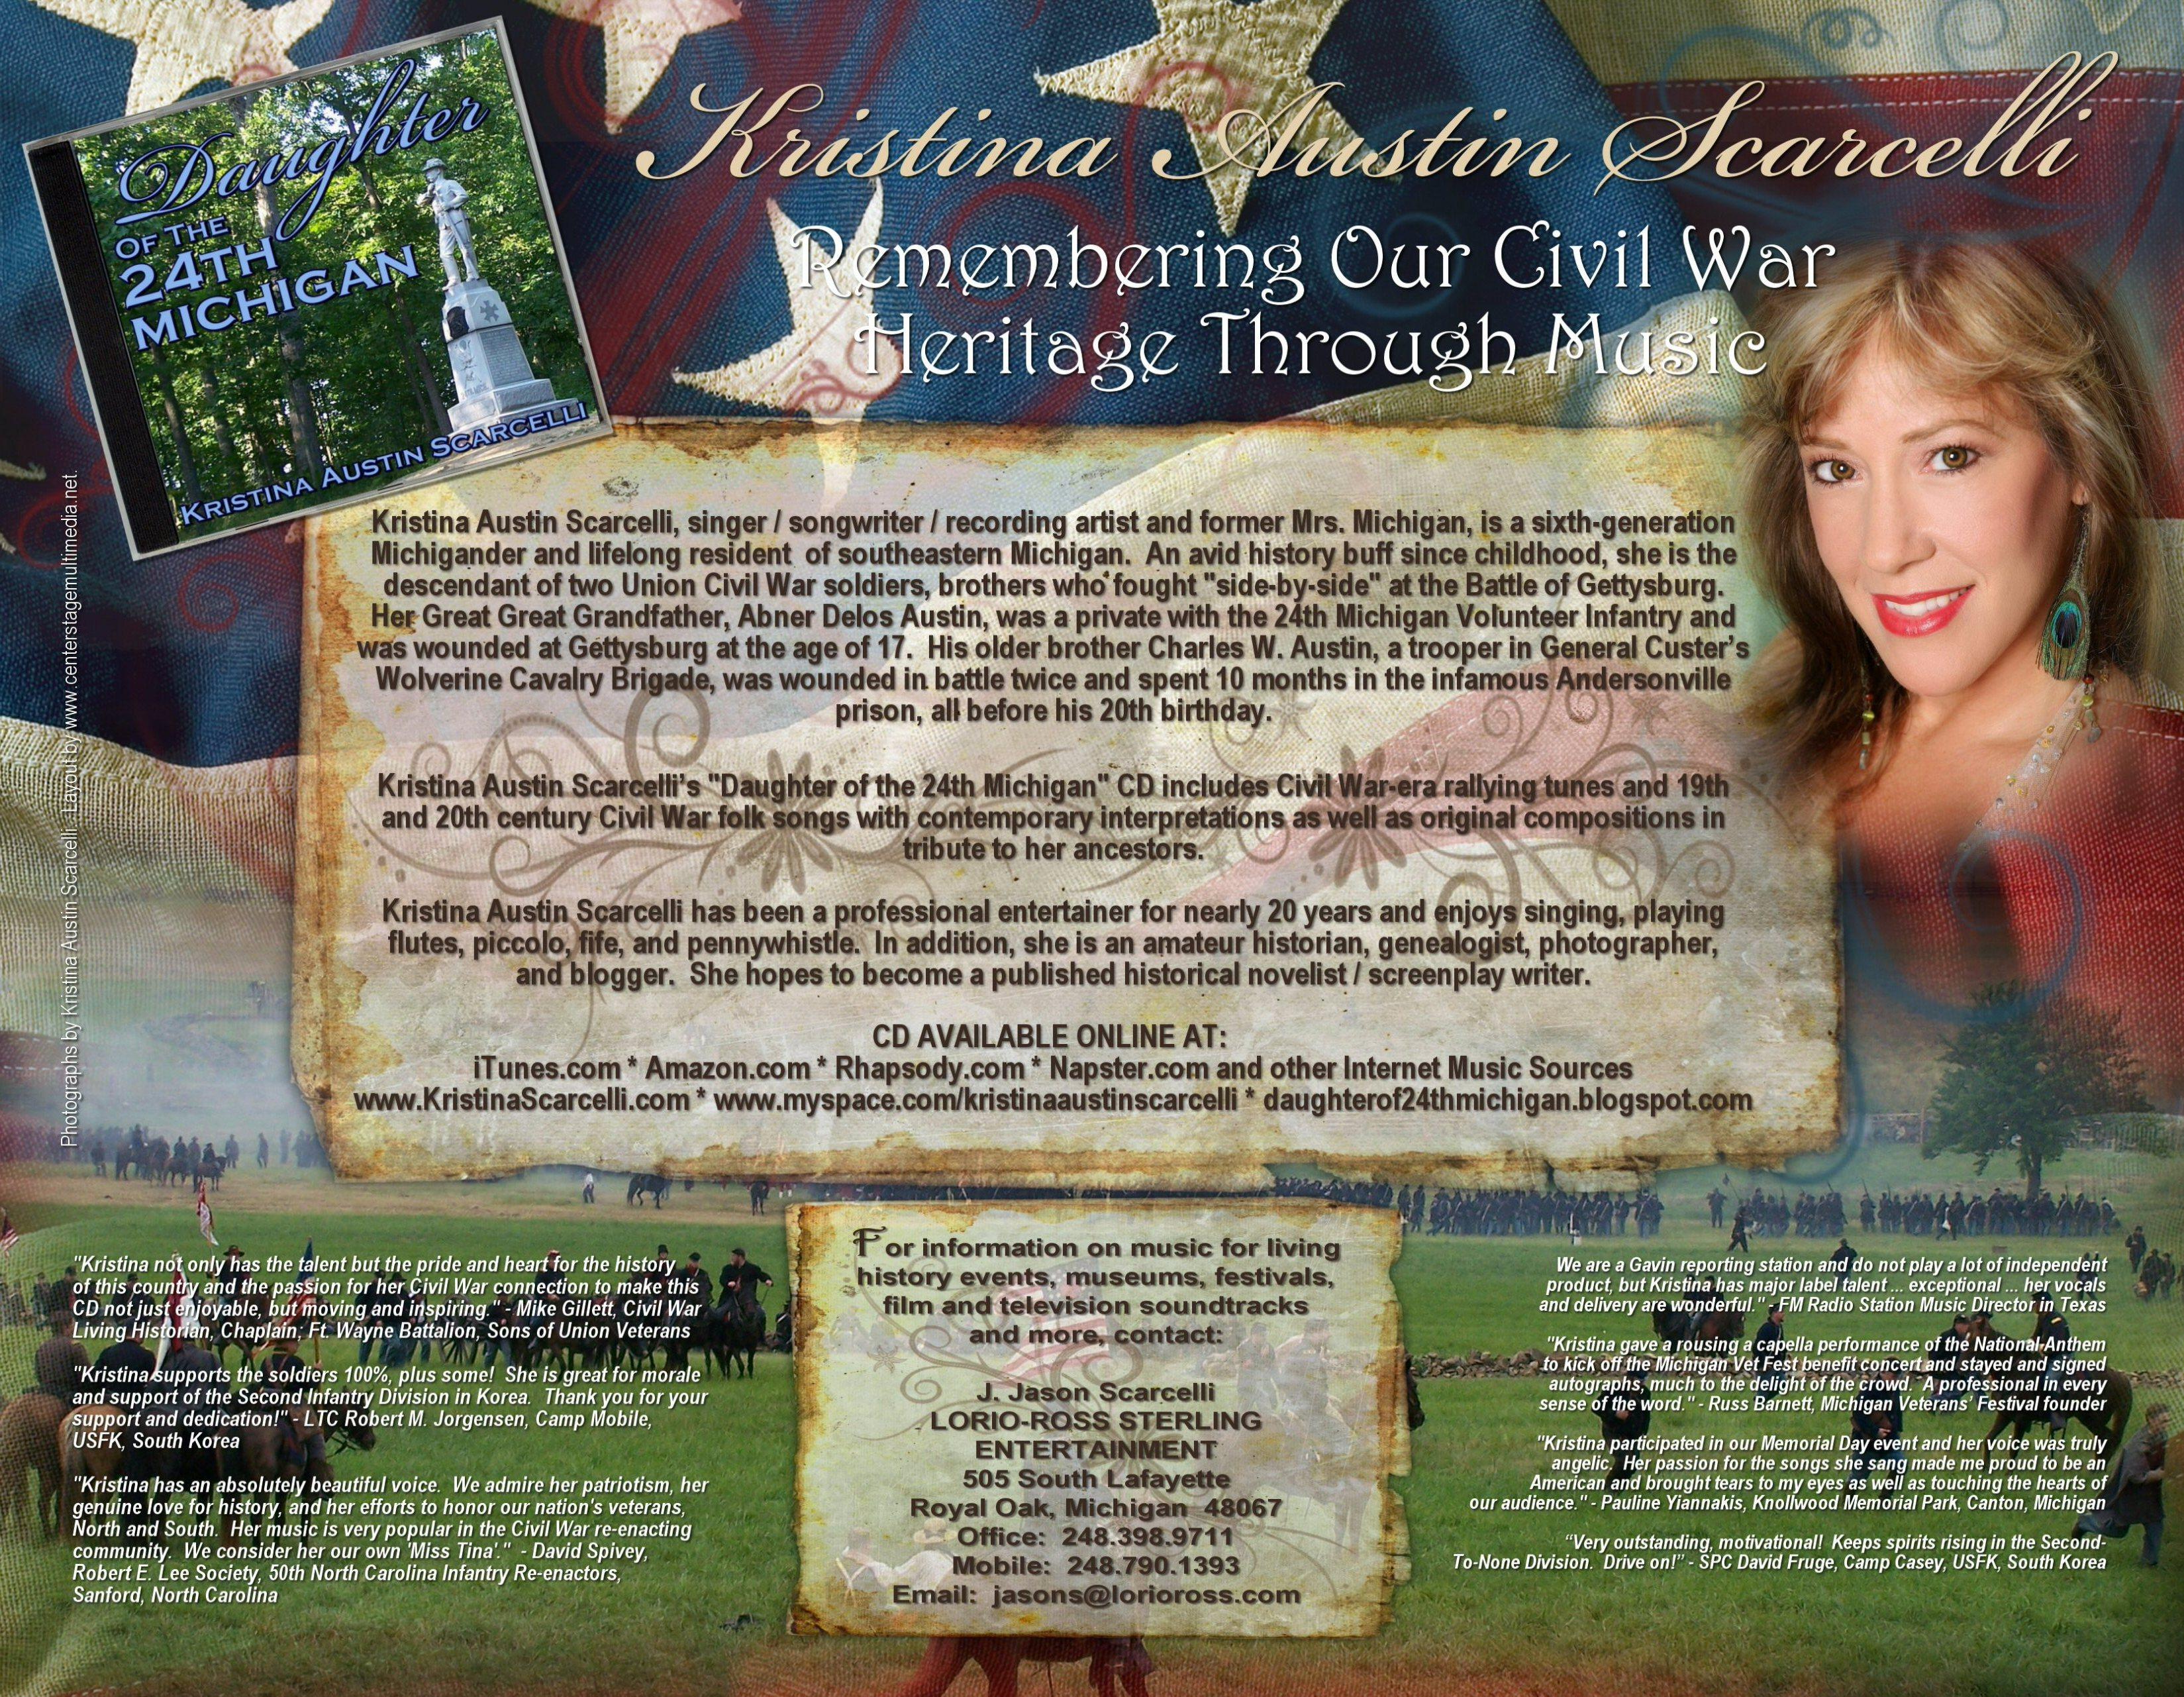 Kristina Austin Scarcelli Daughter of the 24th Michigan Civil War Songs